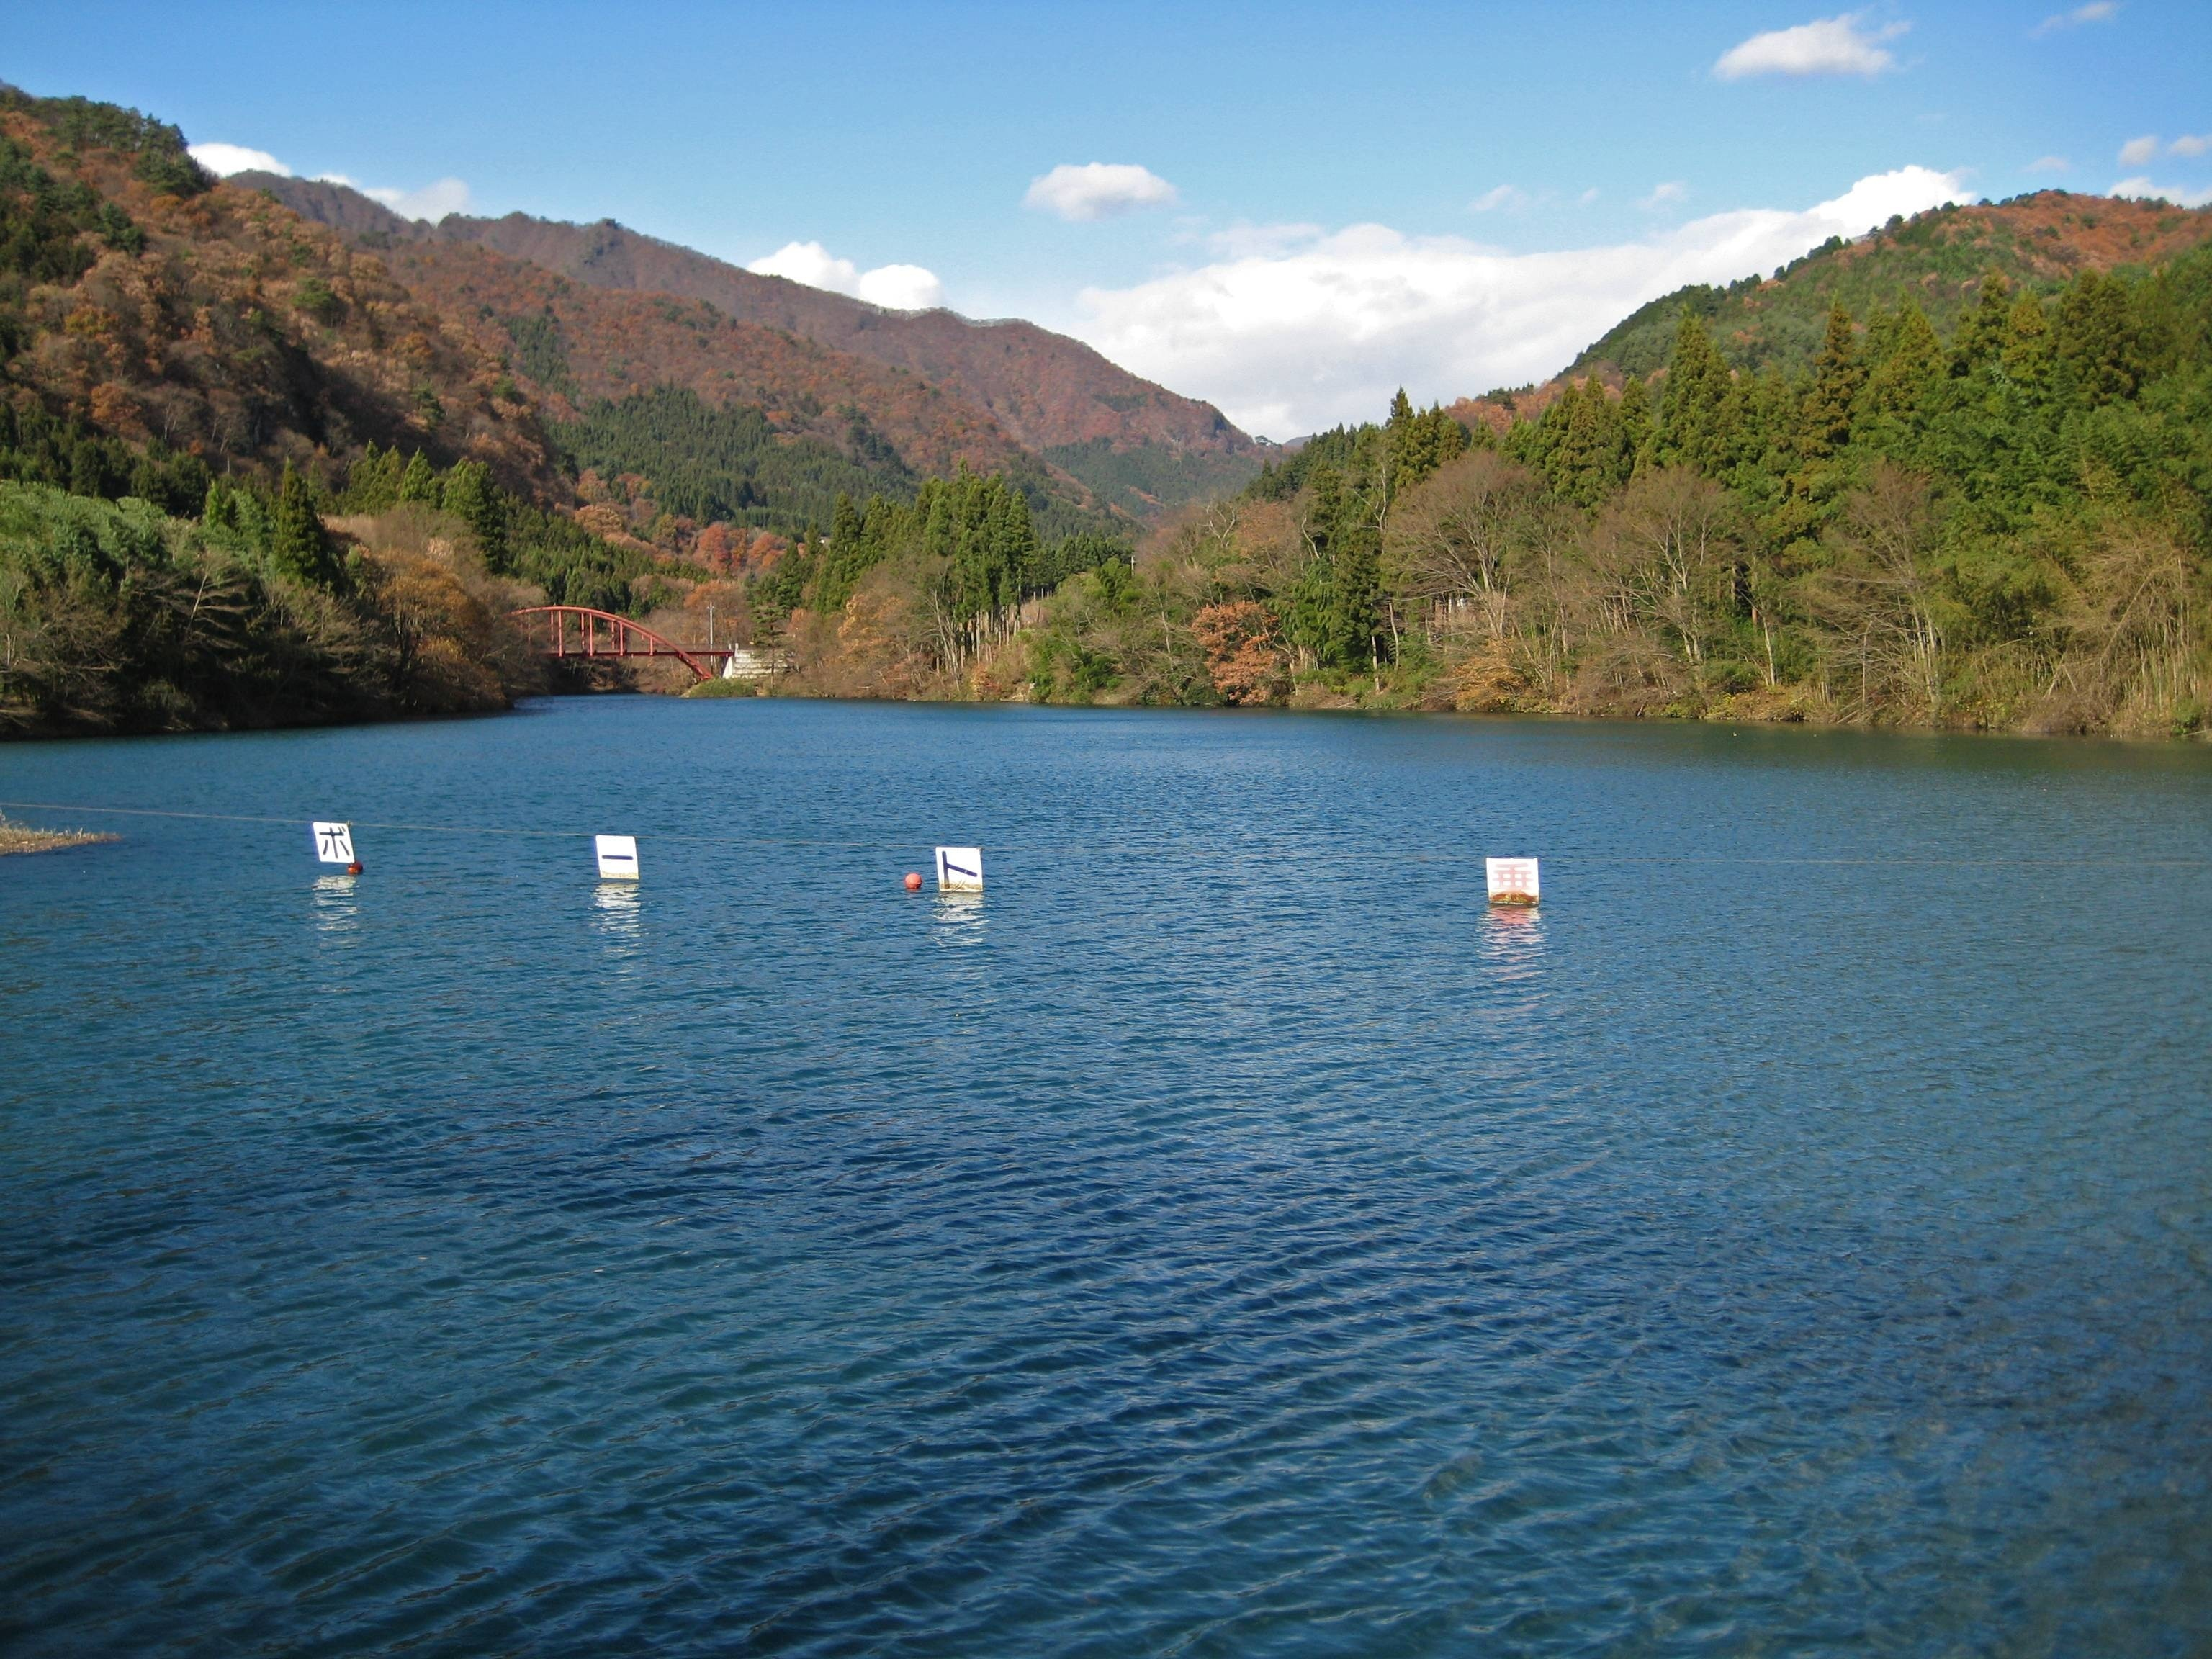 Shima, Nakanojo, Gunma Prefecture, Japan